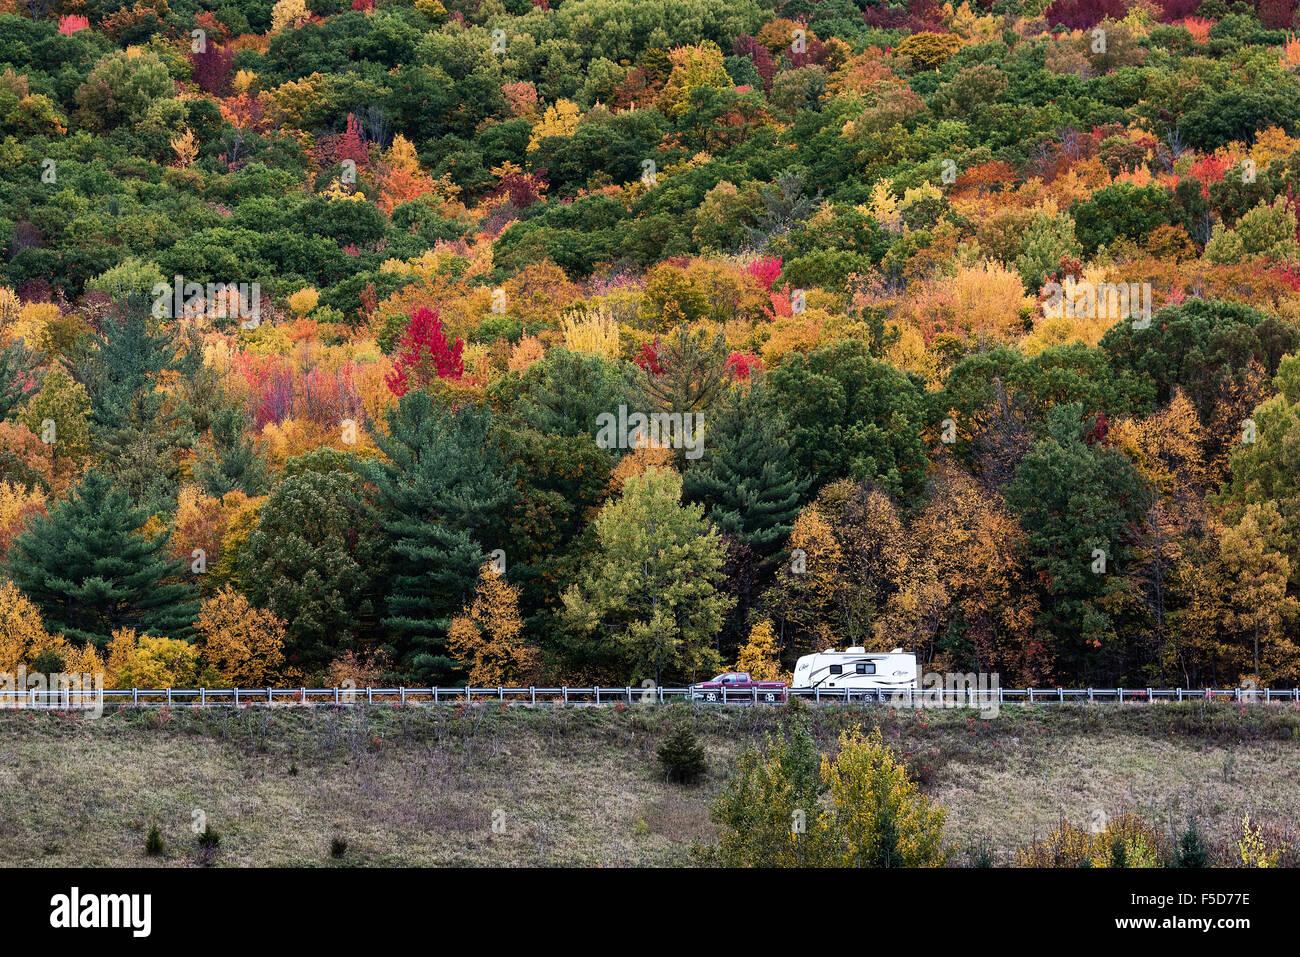 RV camper on an autumn road trip, Castleton, New York, USA - Stock Image